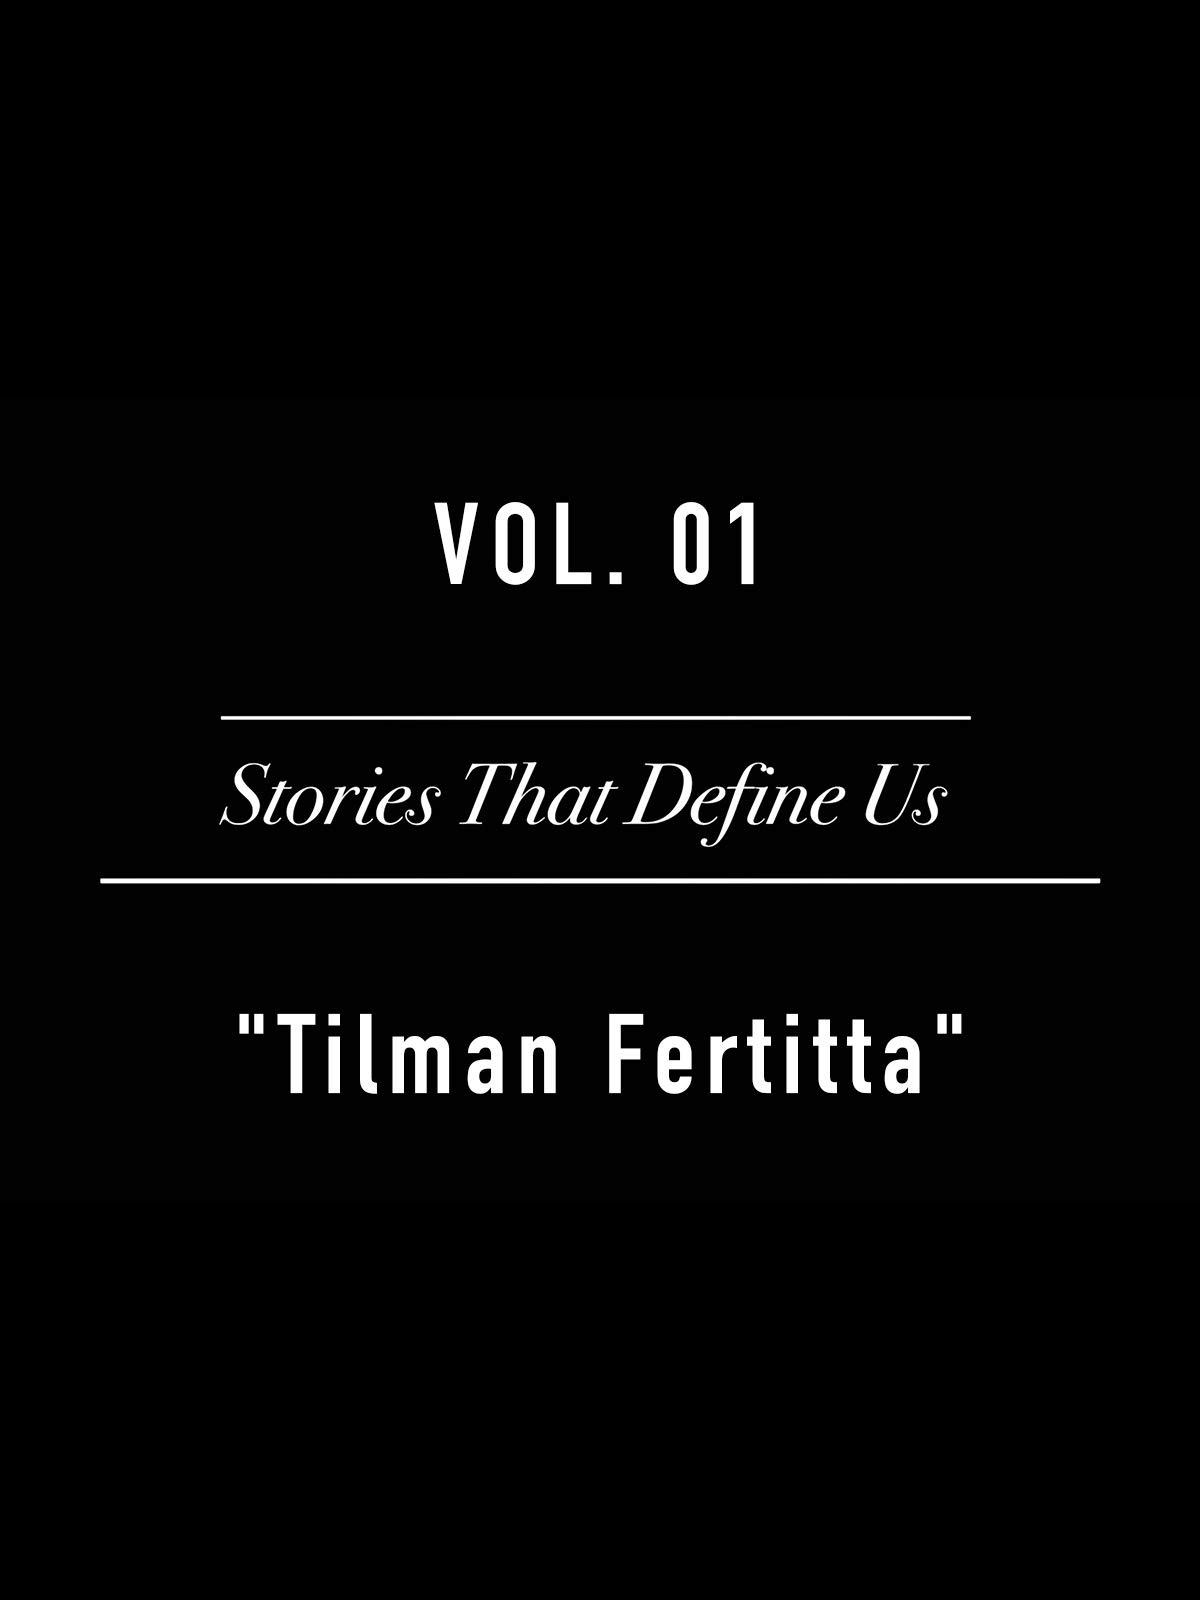 Stories That Define Us Vol. 01